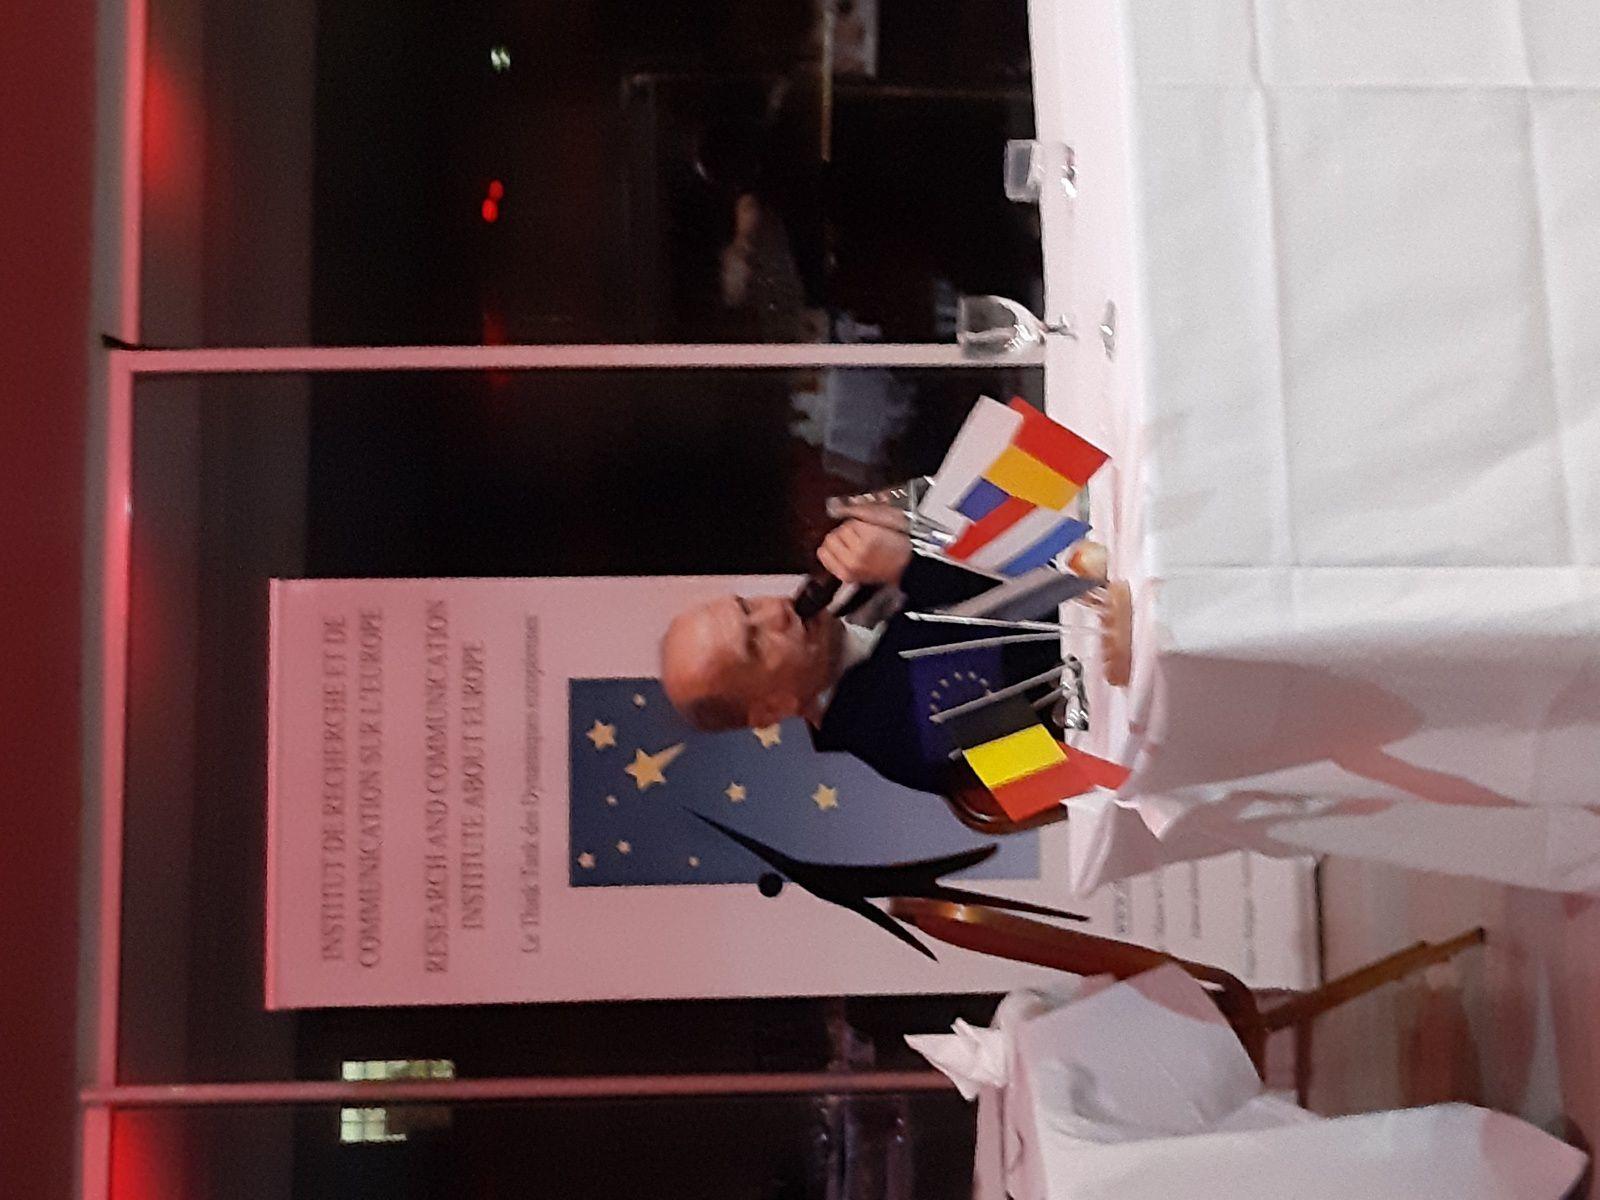 10 DEC - V. FEDOROVSKI - LE RETOUR DE L RUSSIE 30 ANS APRES LA CHUTE DU MUR DE BERLIN